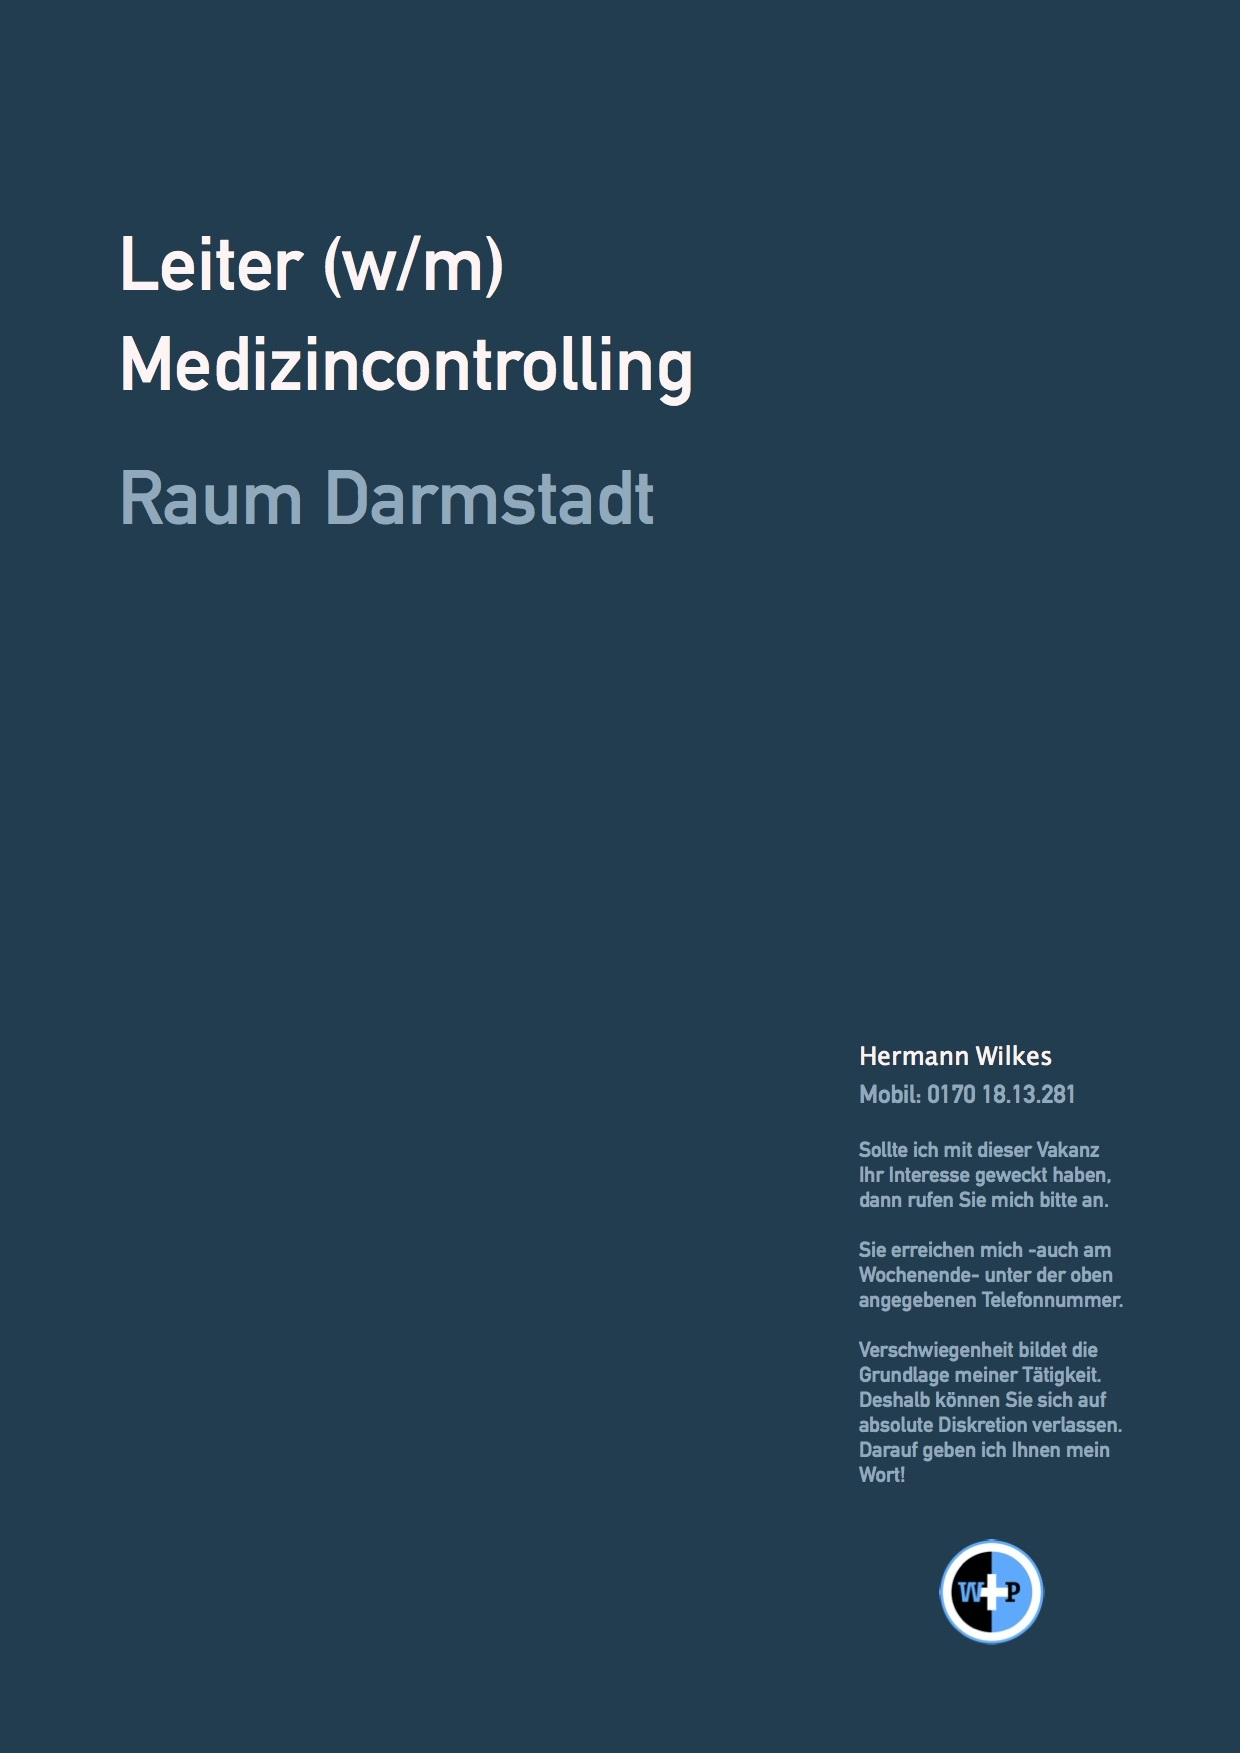 Leiter (w/m) Medizincontrolling - Raum Darmstadt